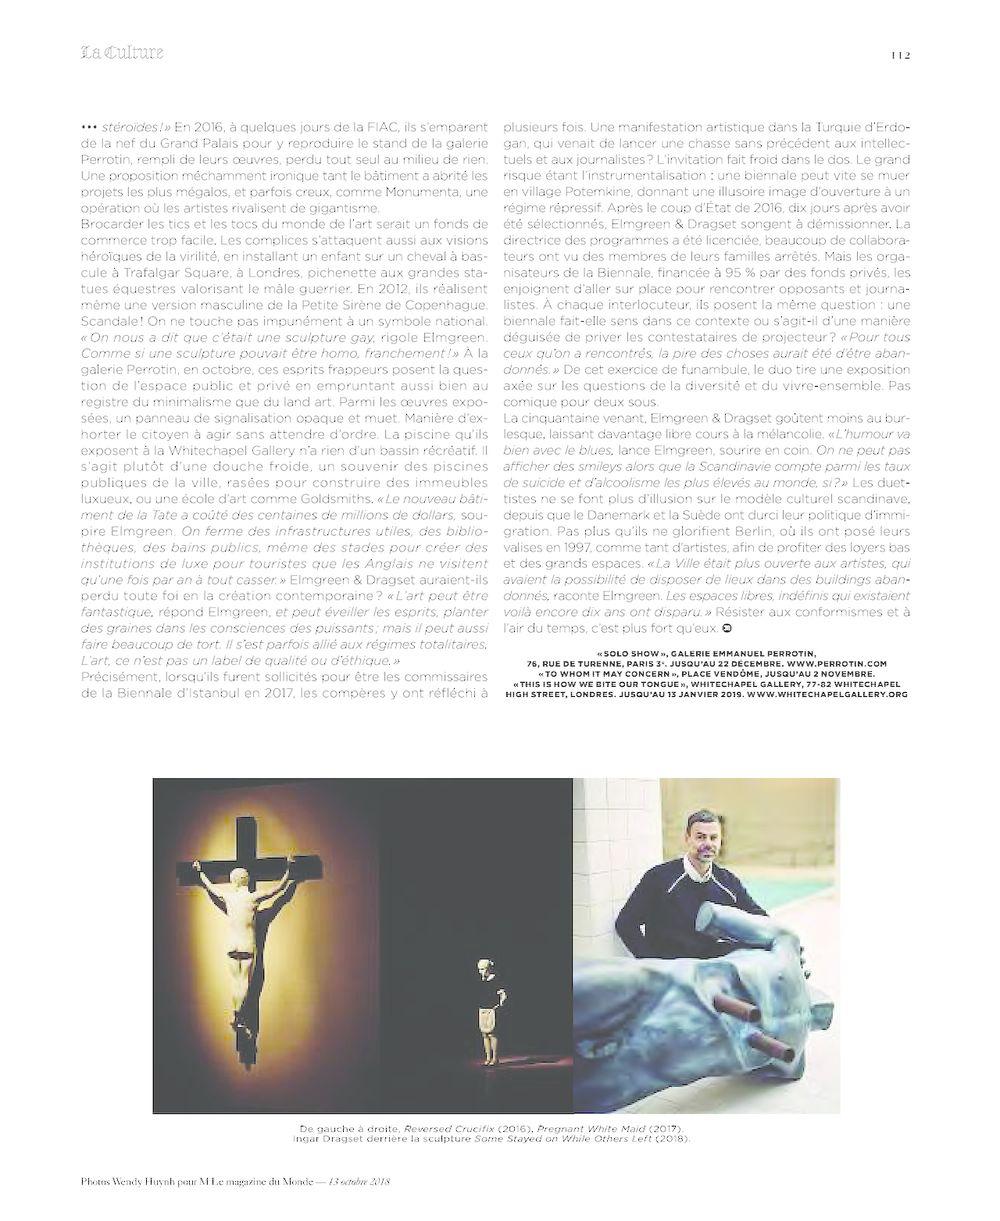 M le Magazine du Monde | 艾默格林 & 德拉塞特